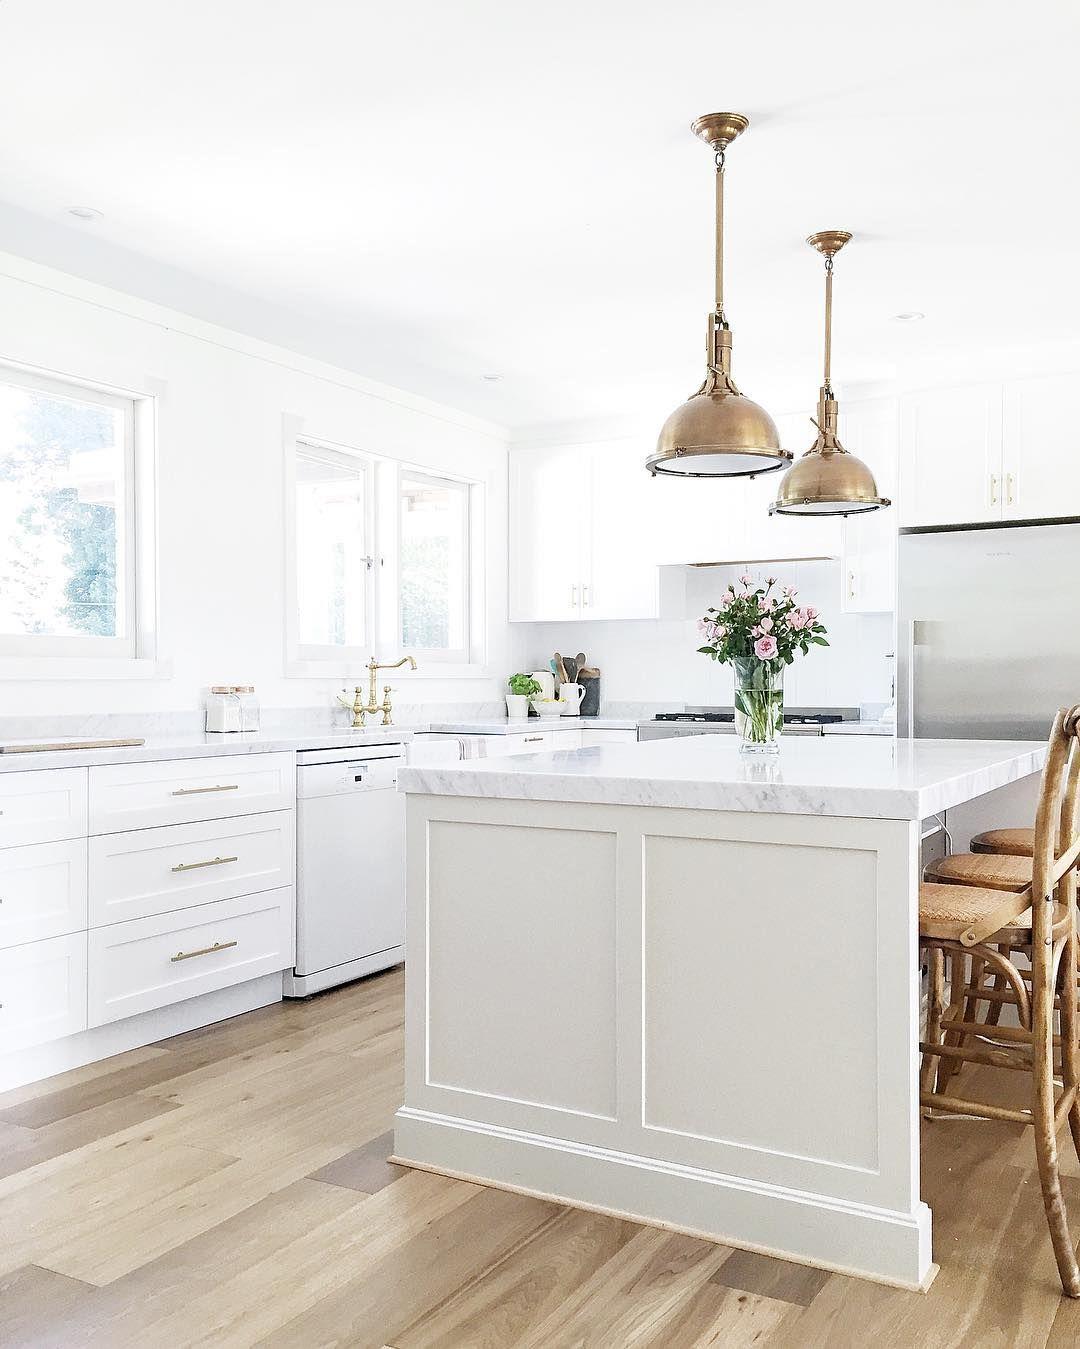 Download Wallpaper White Kitchen Light Hardware